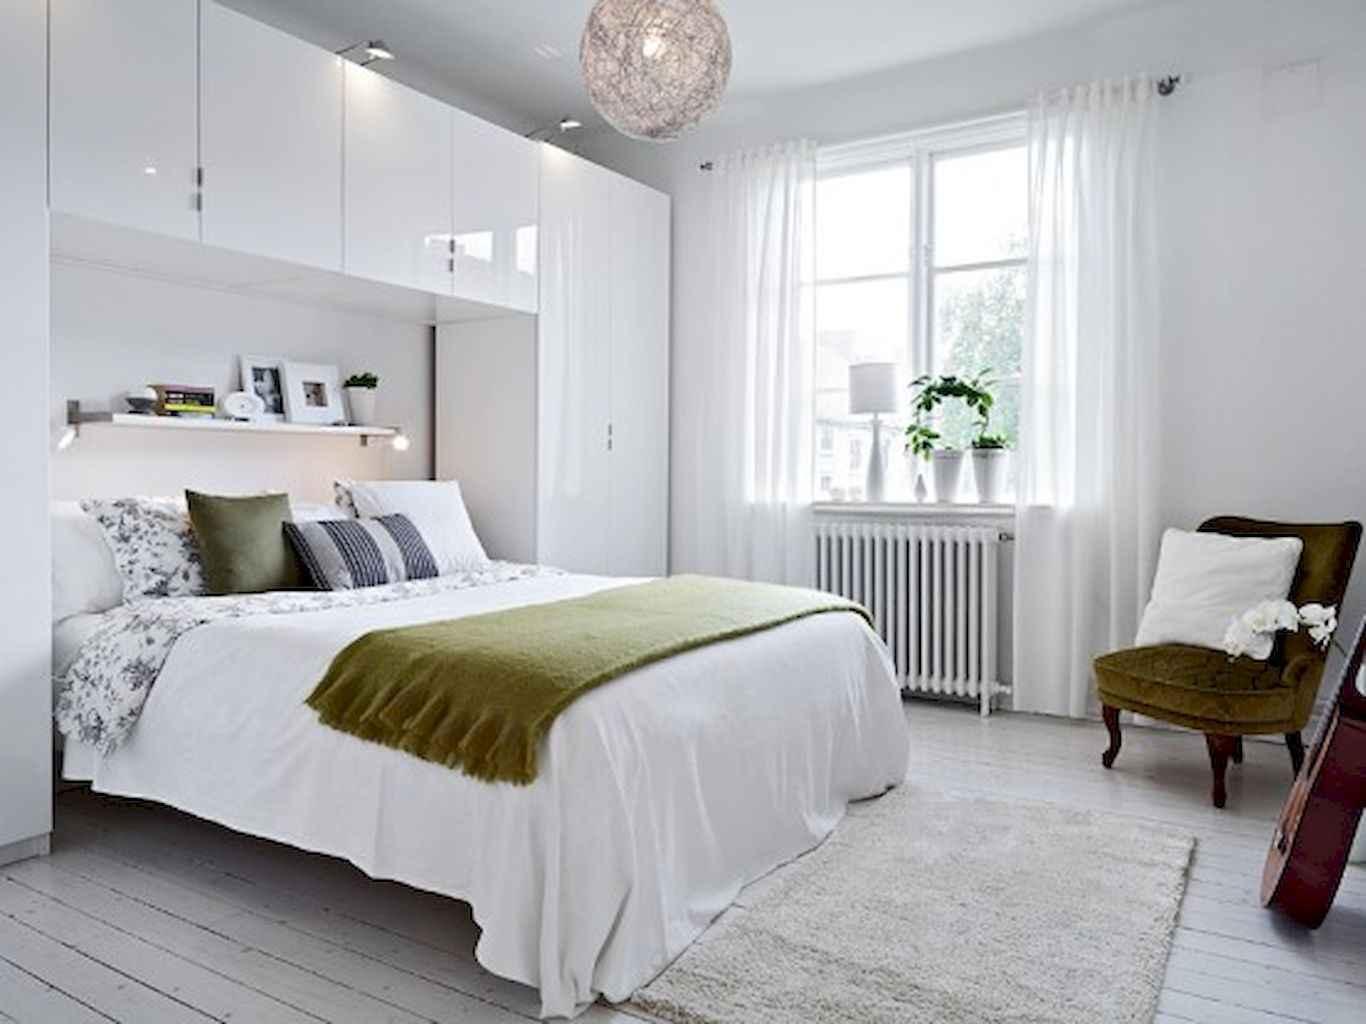 Incredible master bedroom ideas (20)